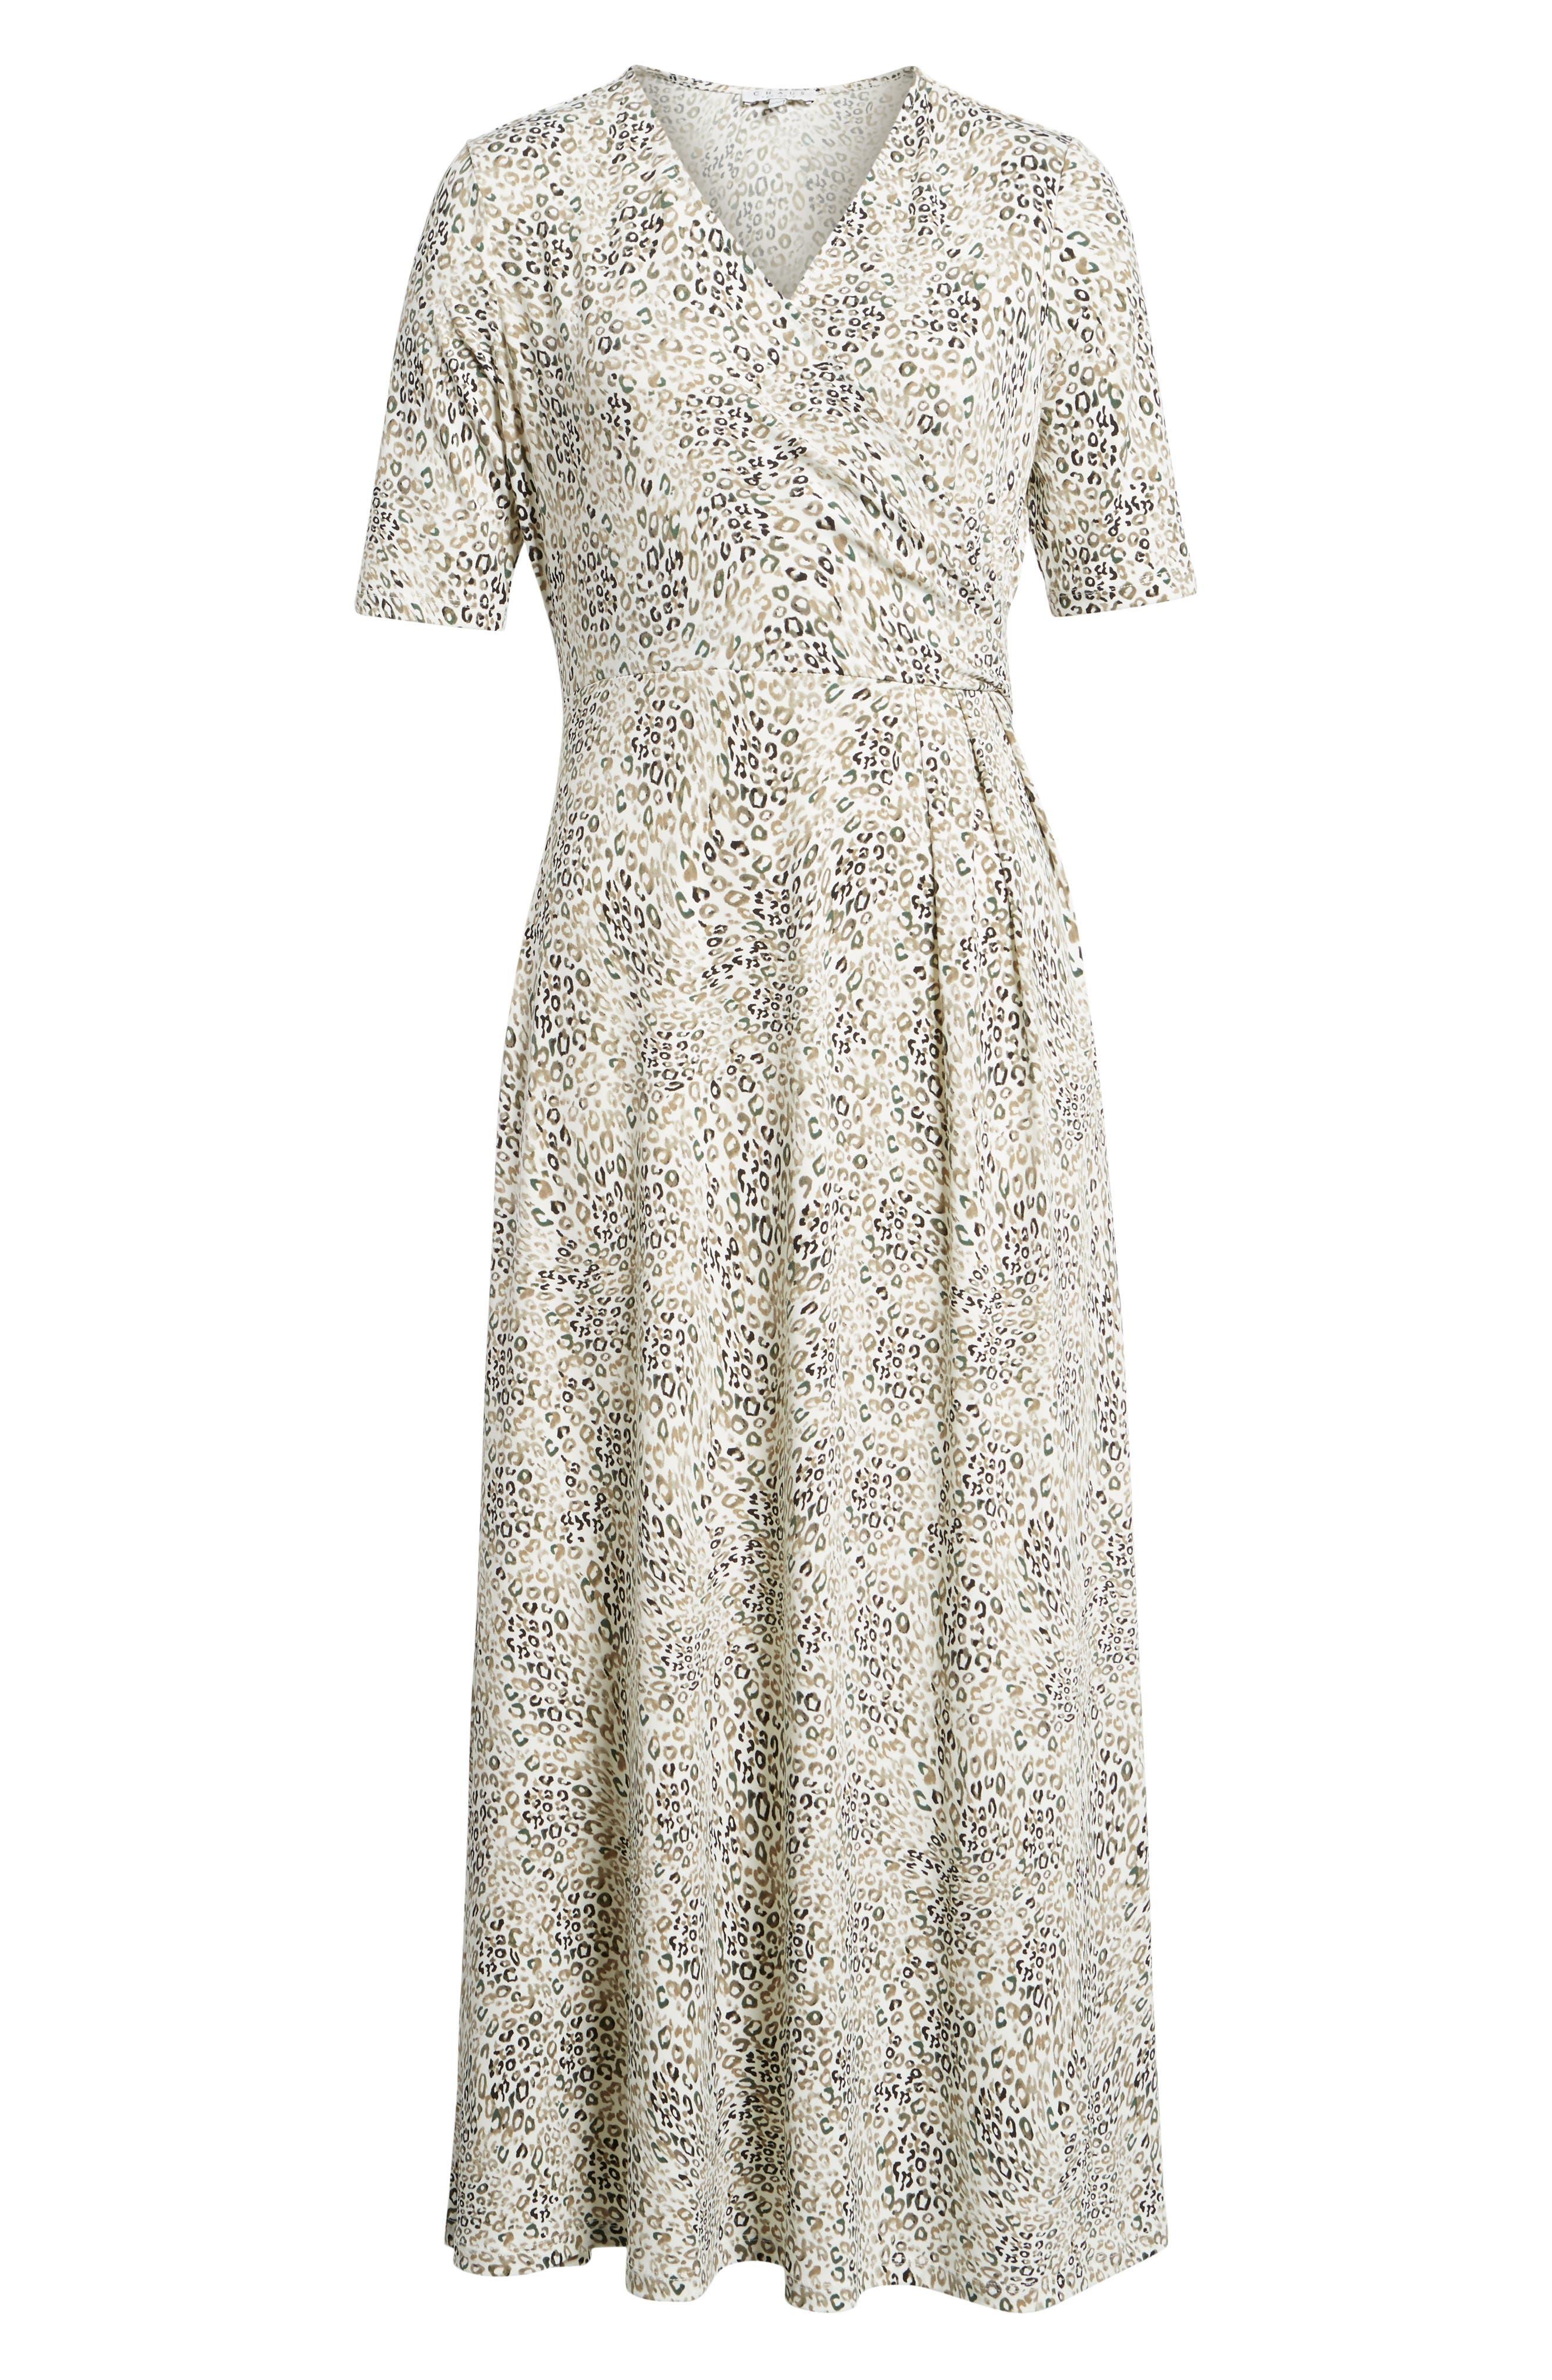 Leopard Print Maxi Dress,                             Alternate thumbnail 6, color,                             900